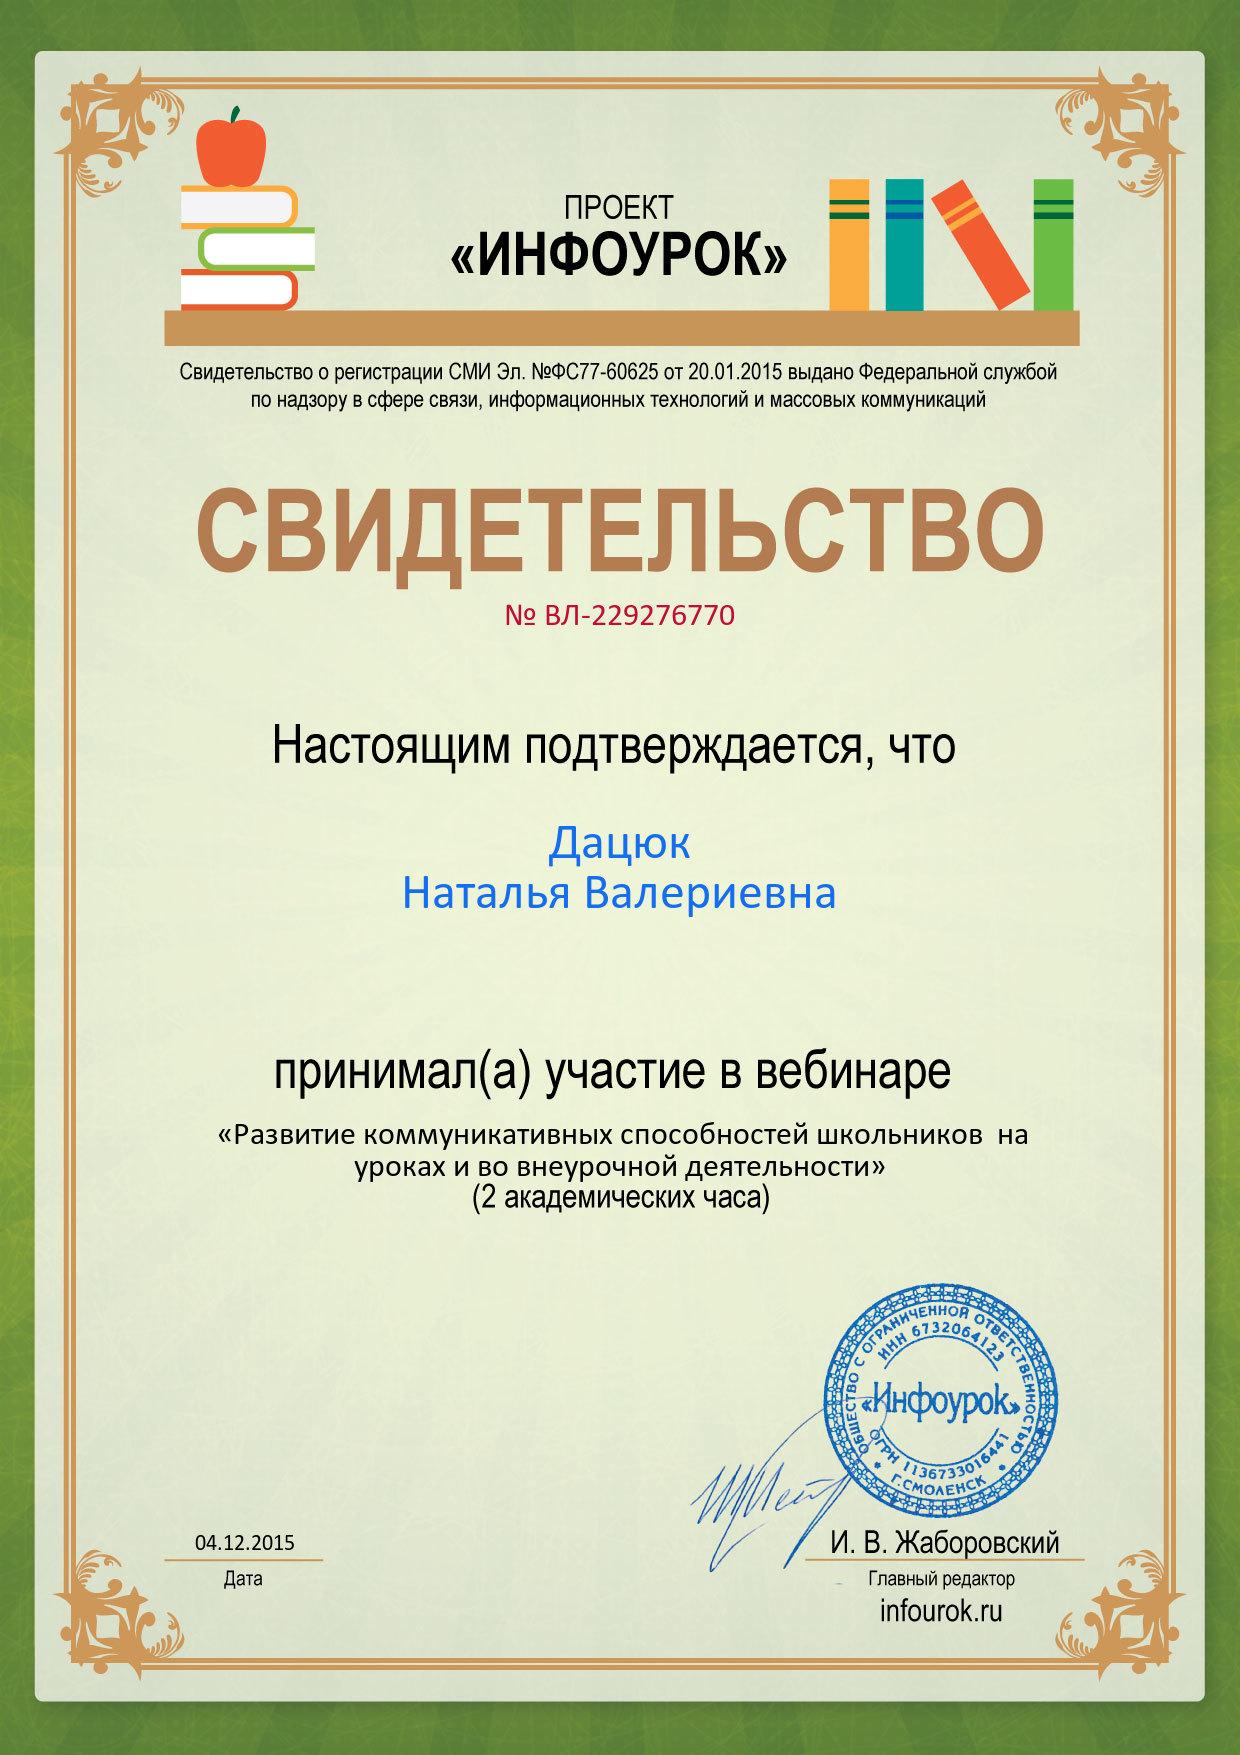 C:\Users\COMPP\Downloads\Свидетельство проекта infourok.ru № ВЛ-229276770.jpg